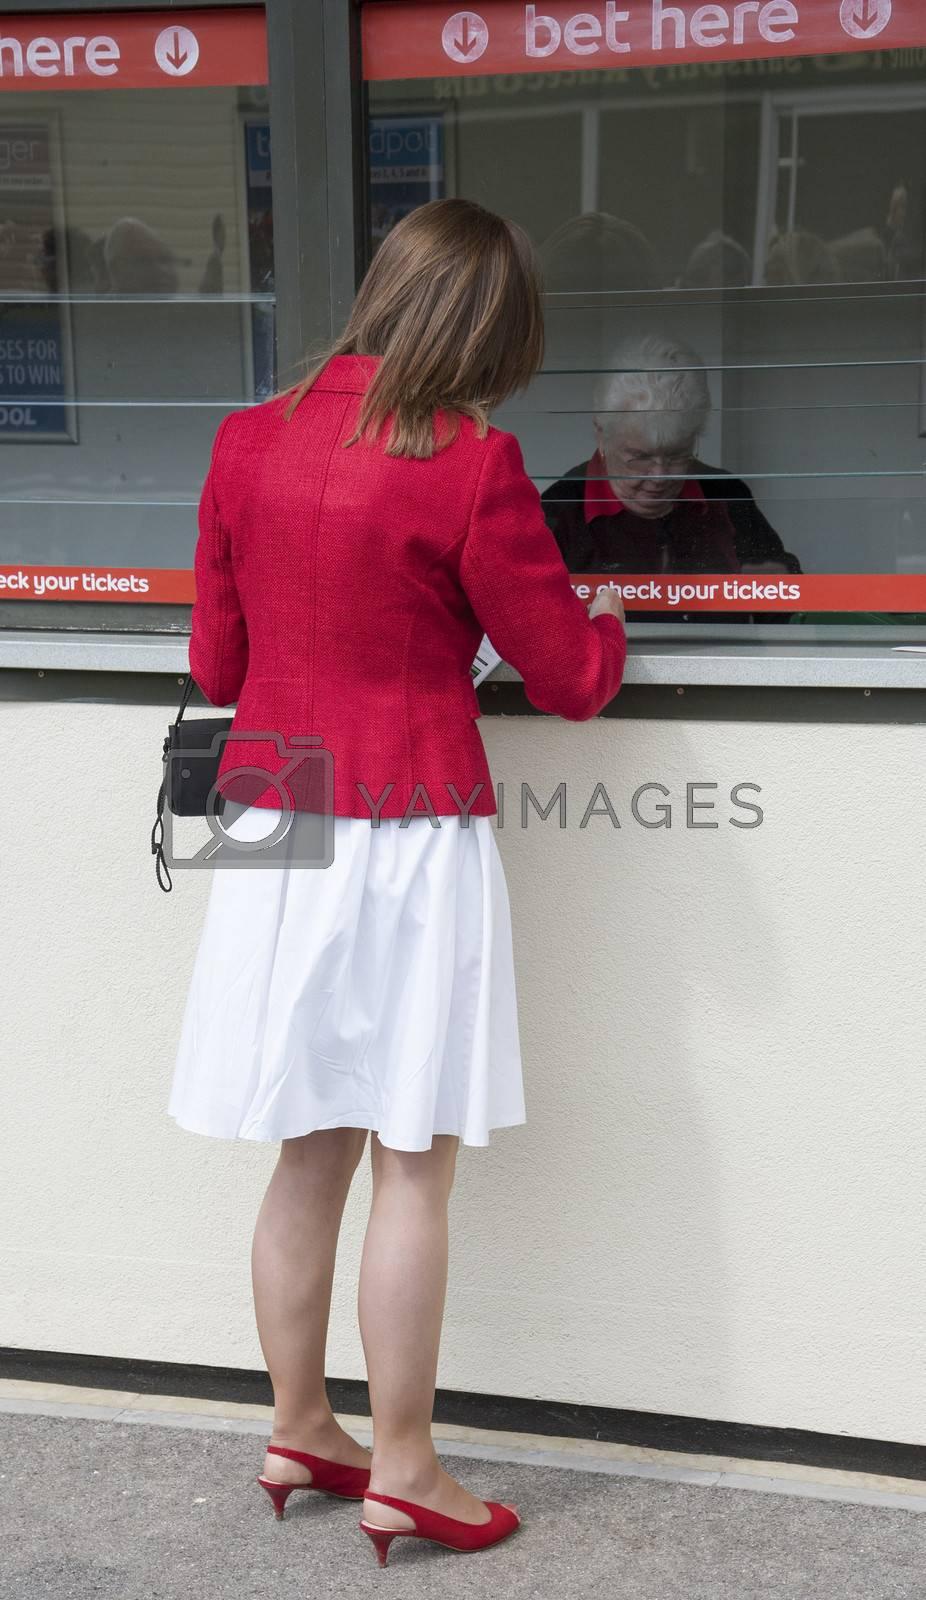 Female racegoer placing a bet